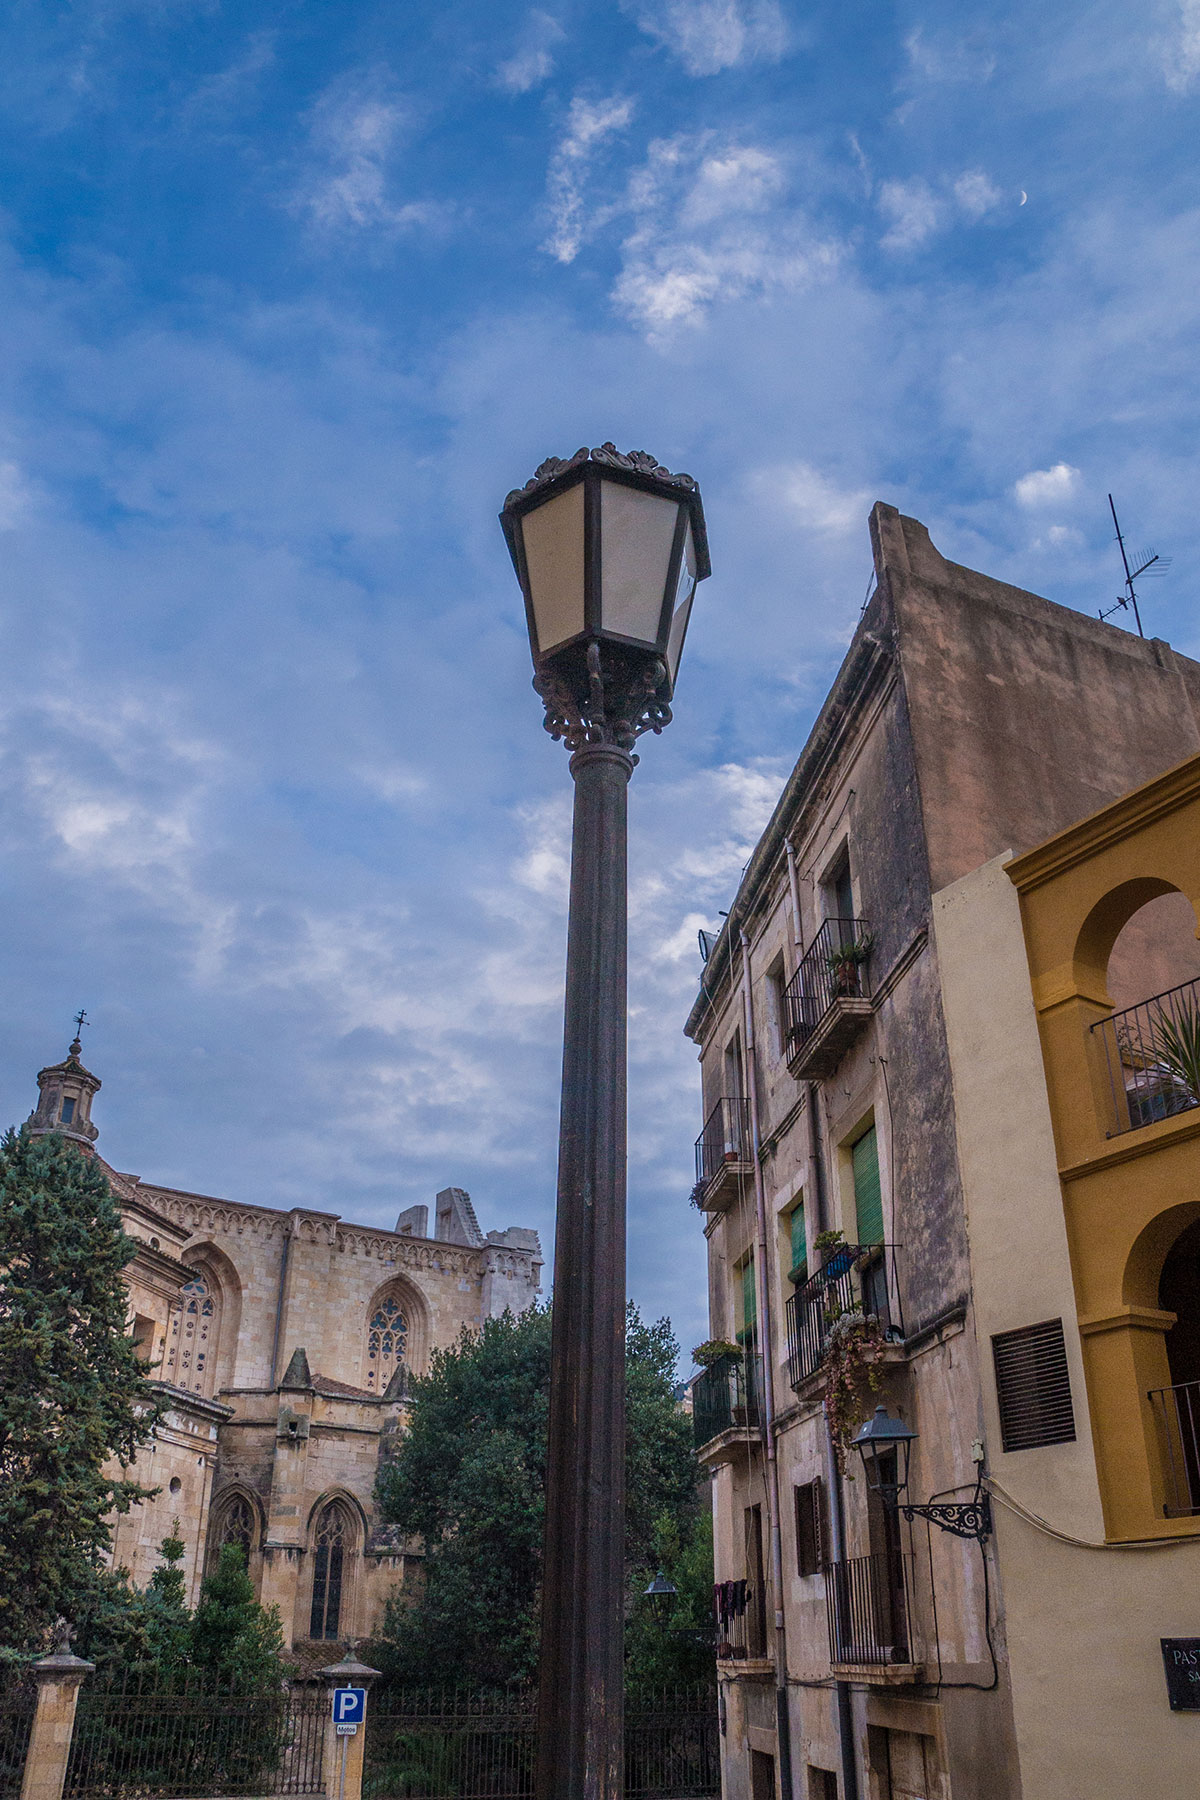 Spain, Catalonia, Tarragona, lantern